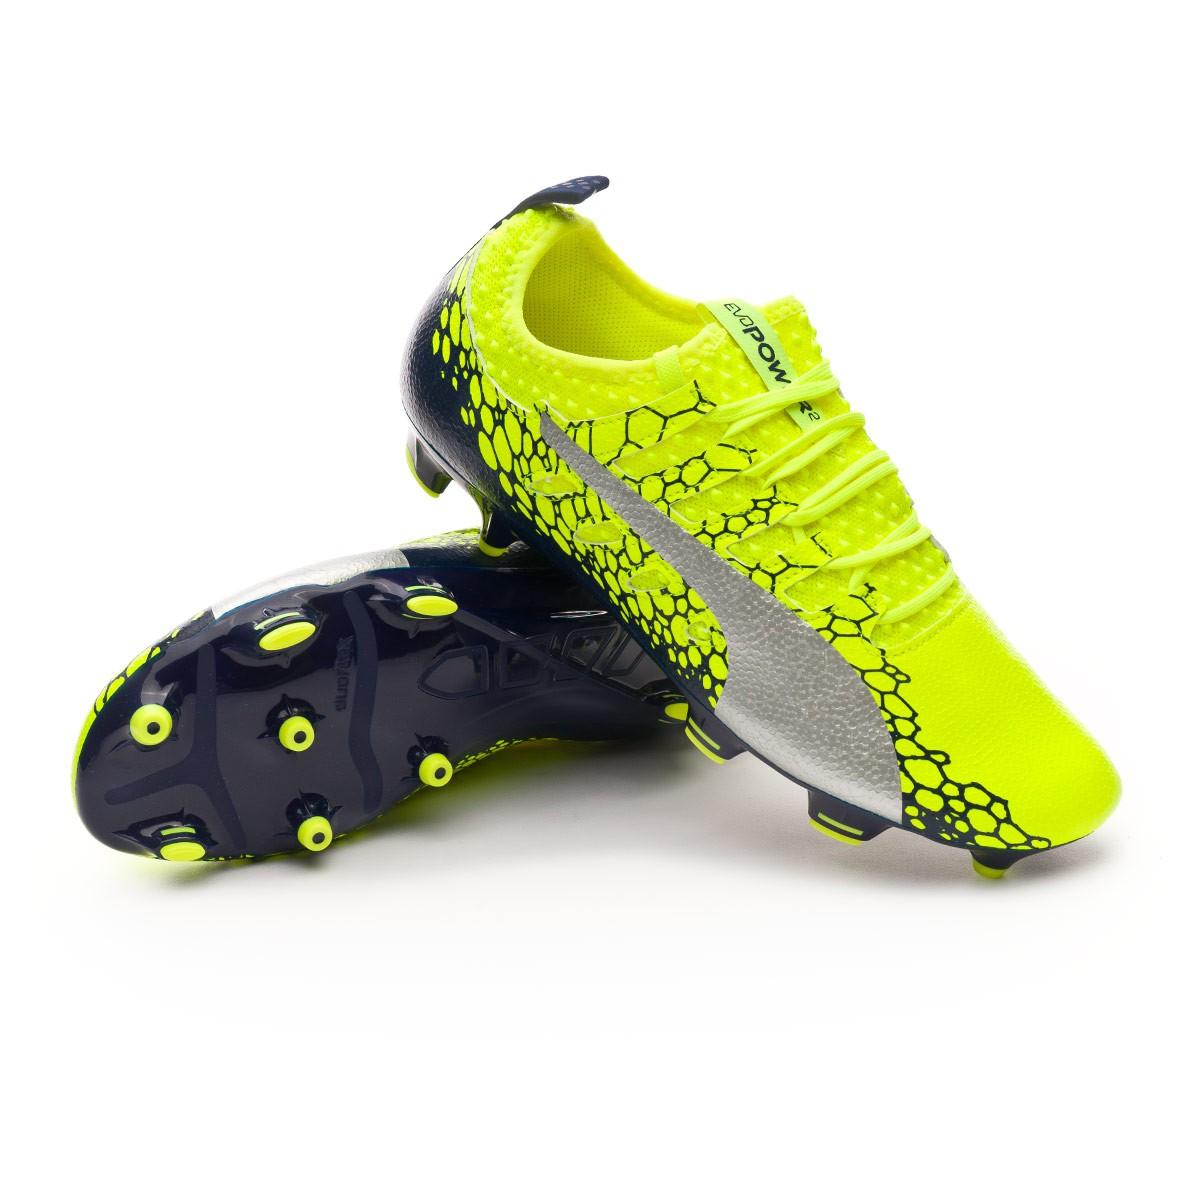 Bota de fútbol Puma evoPOWER Vigor 2 Graphic FG Safety yellow-Silver ... 5964024ac9cb2